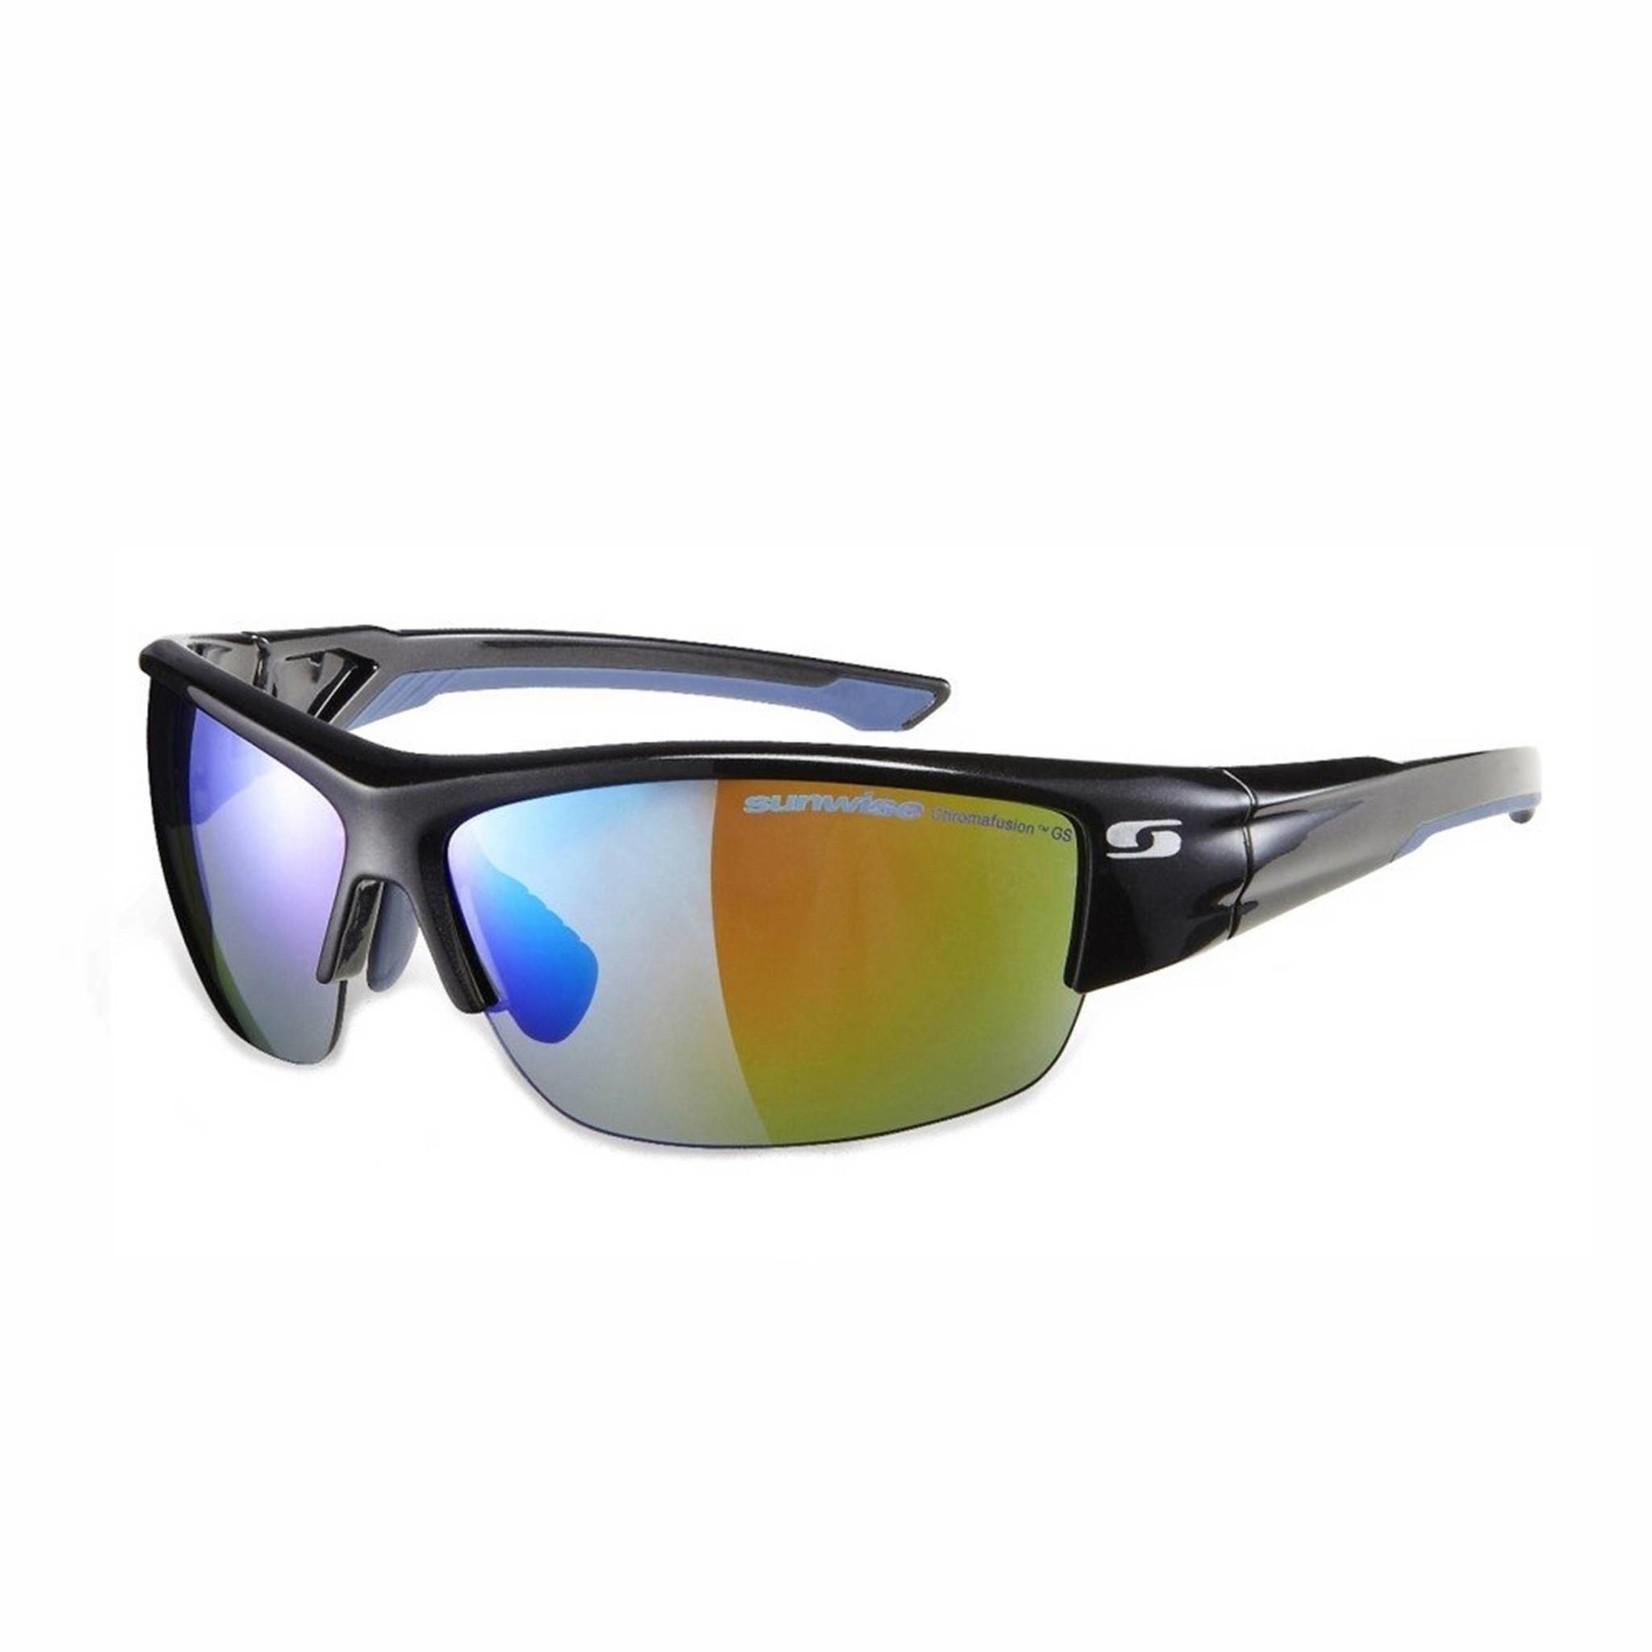 Sunwise Wellington GS Sunglasses Black